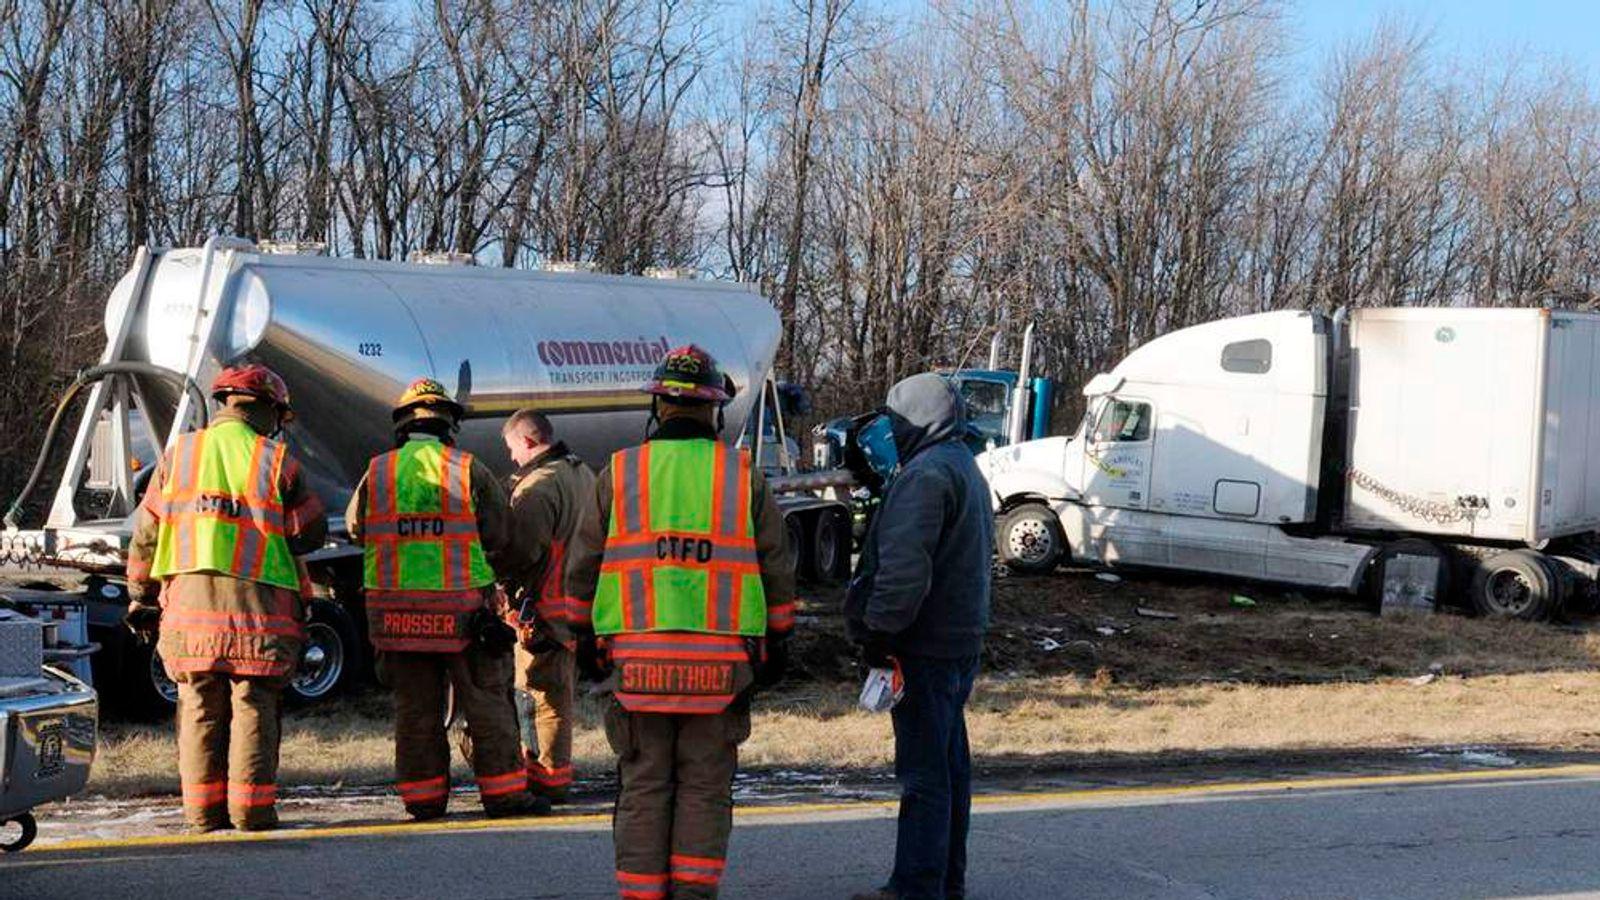 Ohio authorities respond to multi-car crash on Interstate 275 near Cincinnati